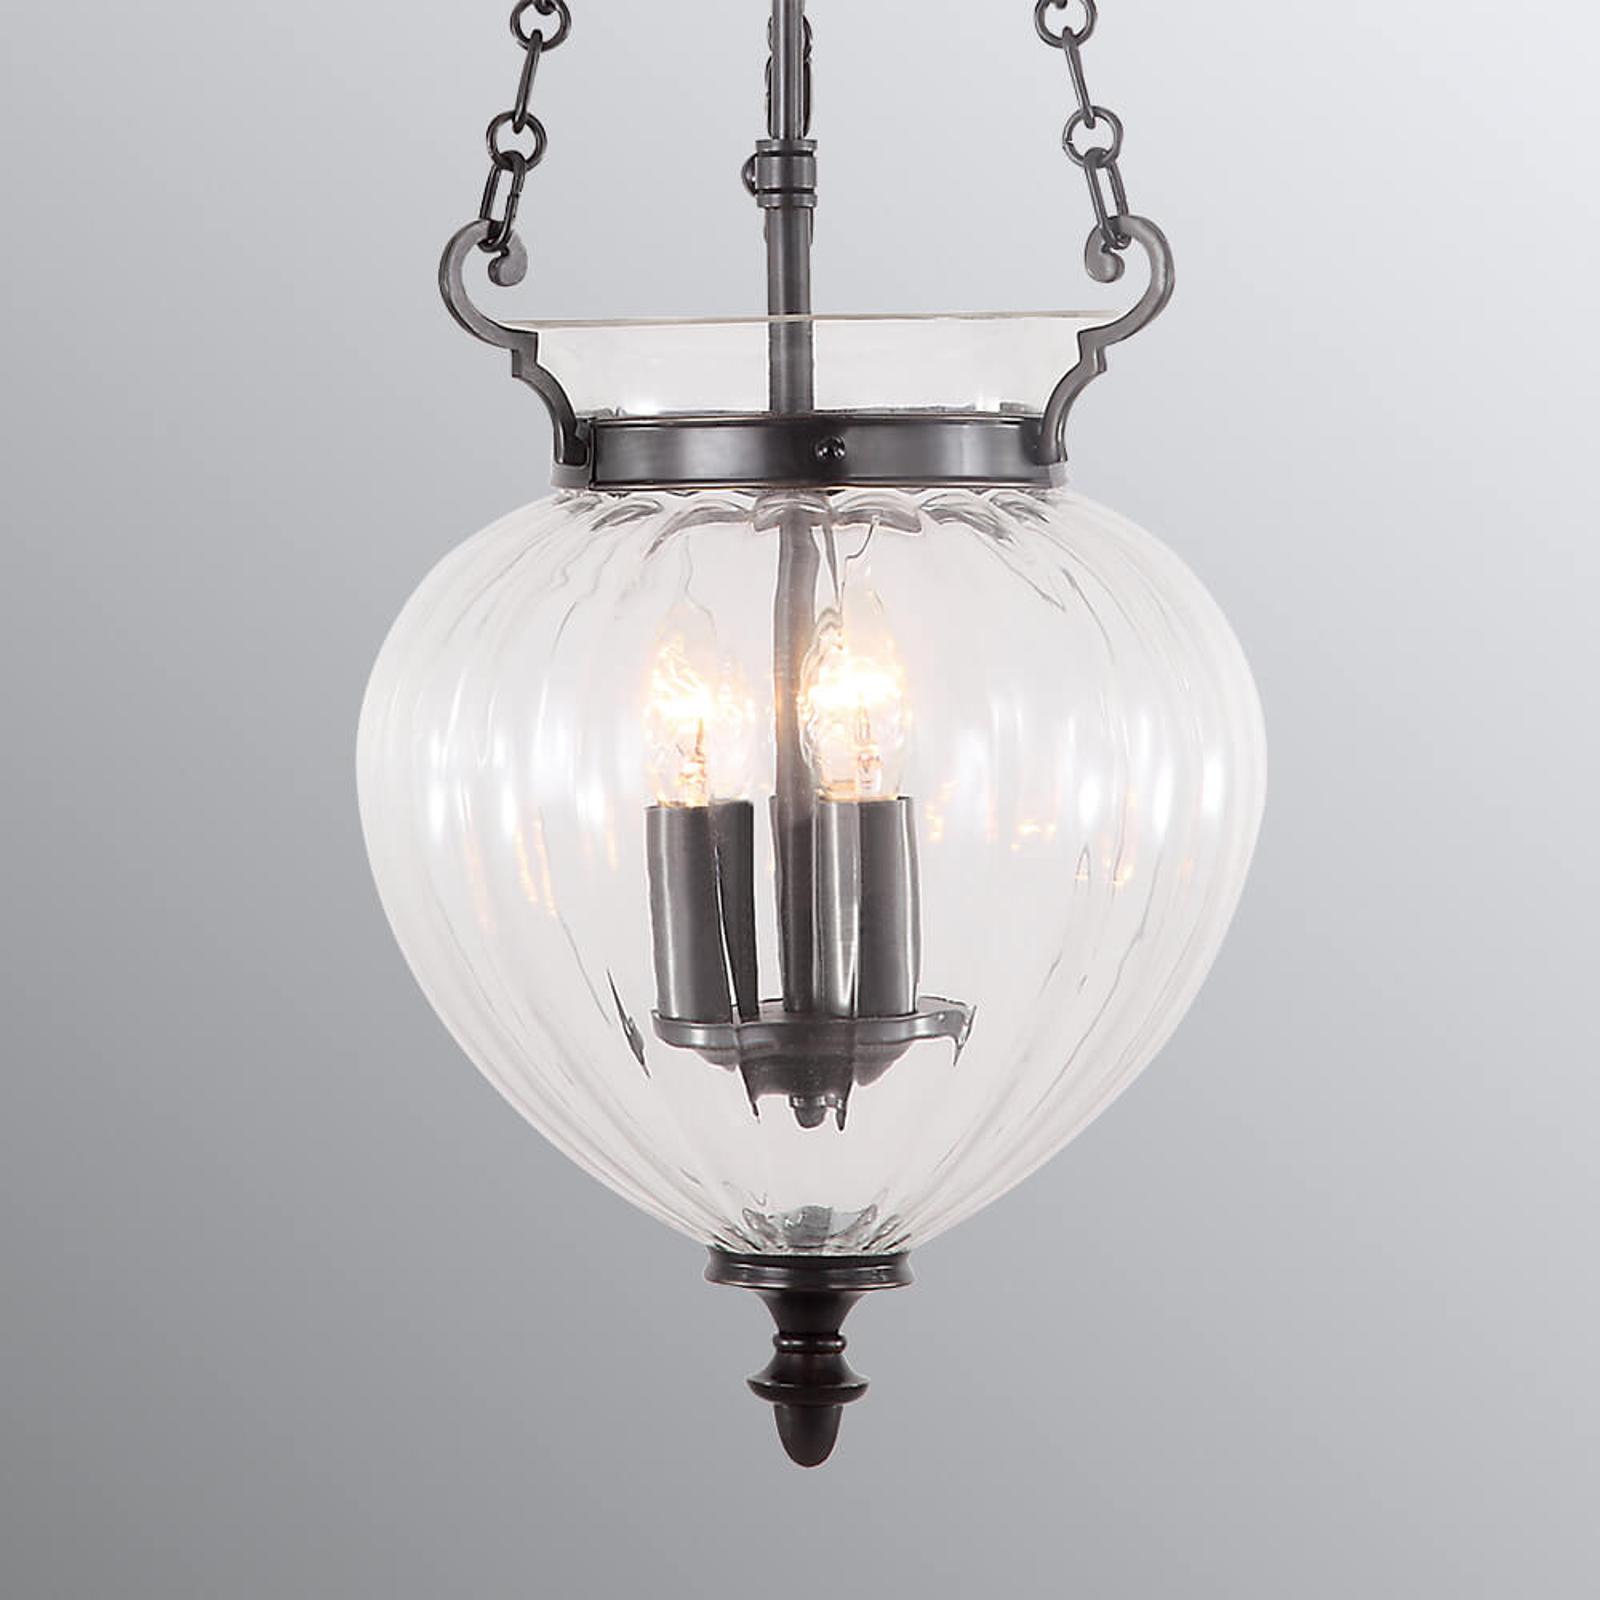 In der hoogte instelbare hanglamp Finsbury Park